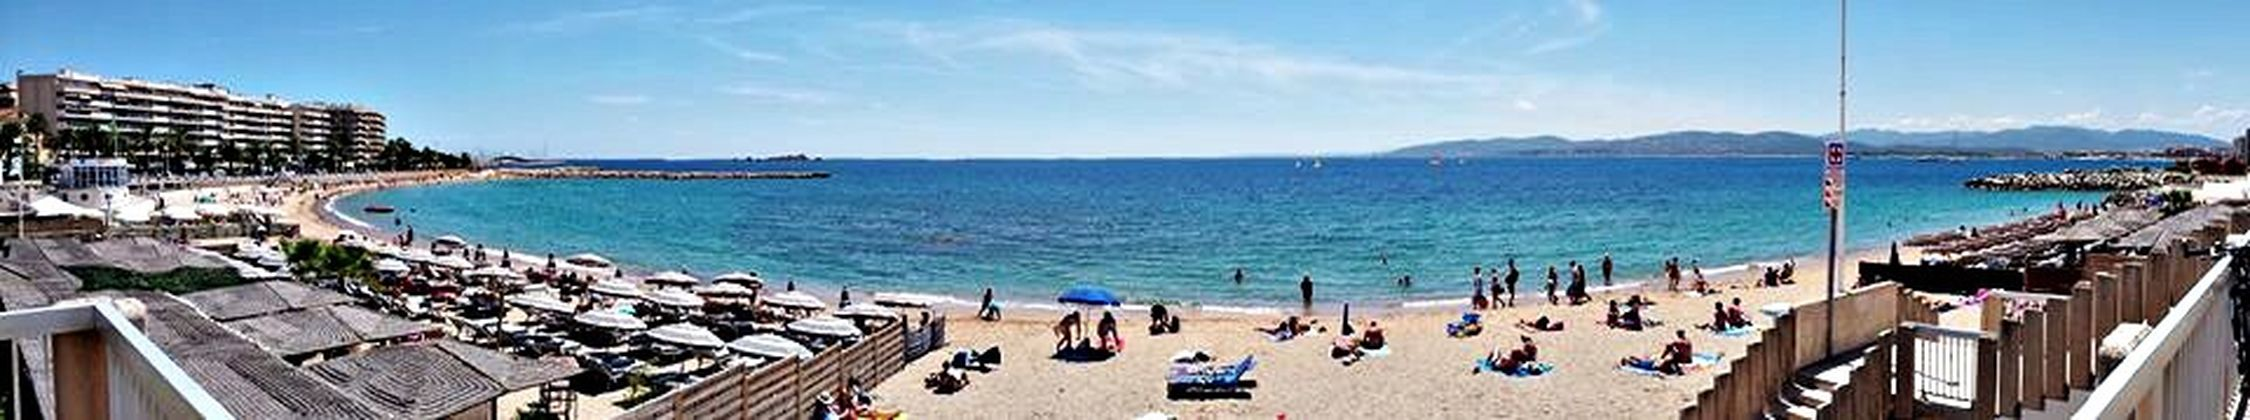 ptn dvacances ? Holiday Hello World Beach